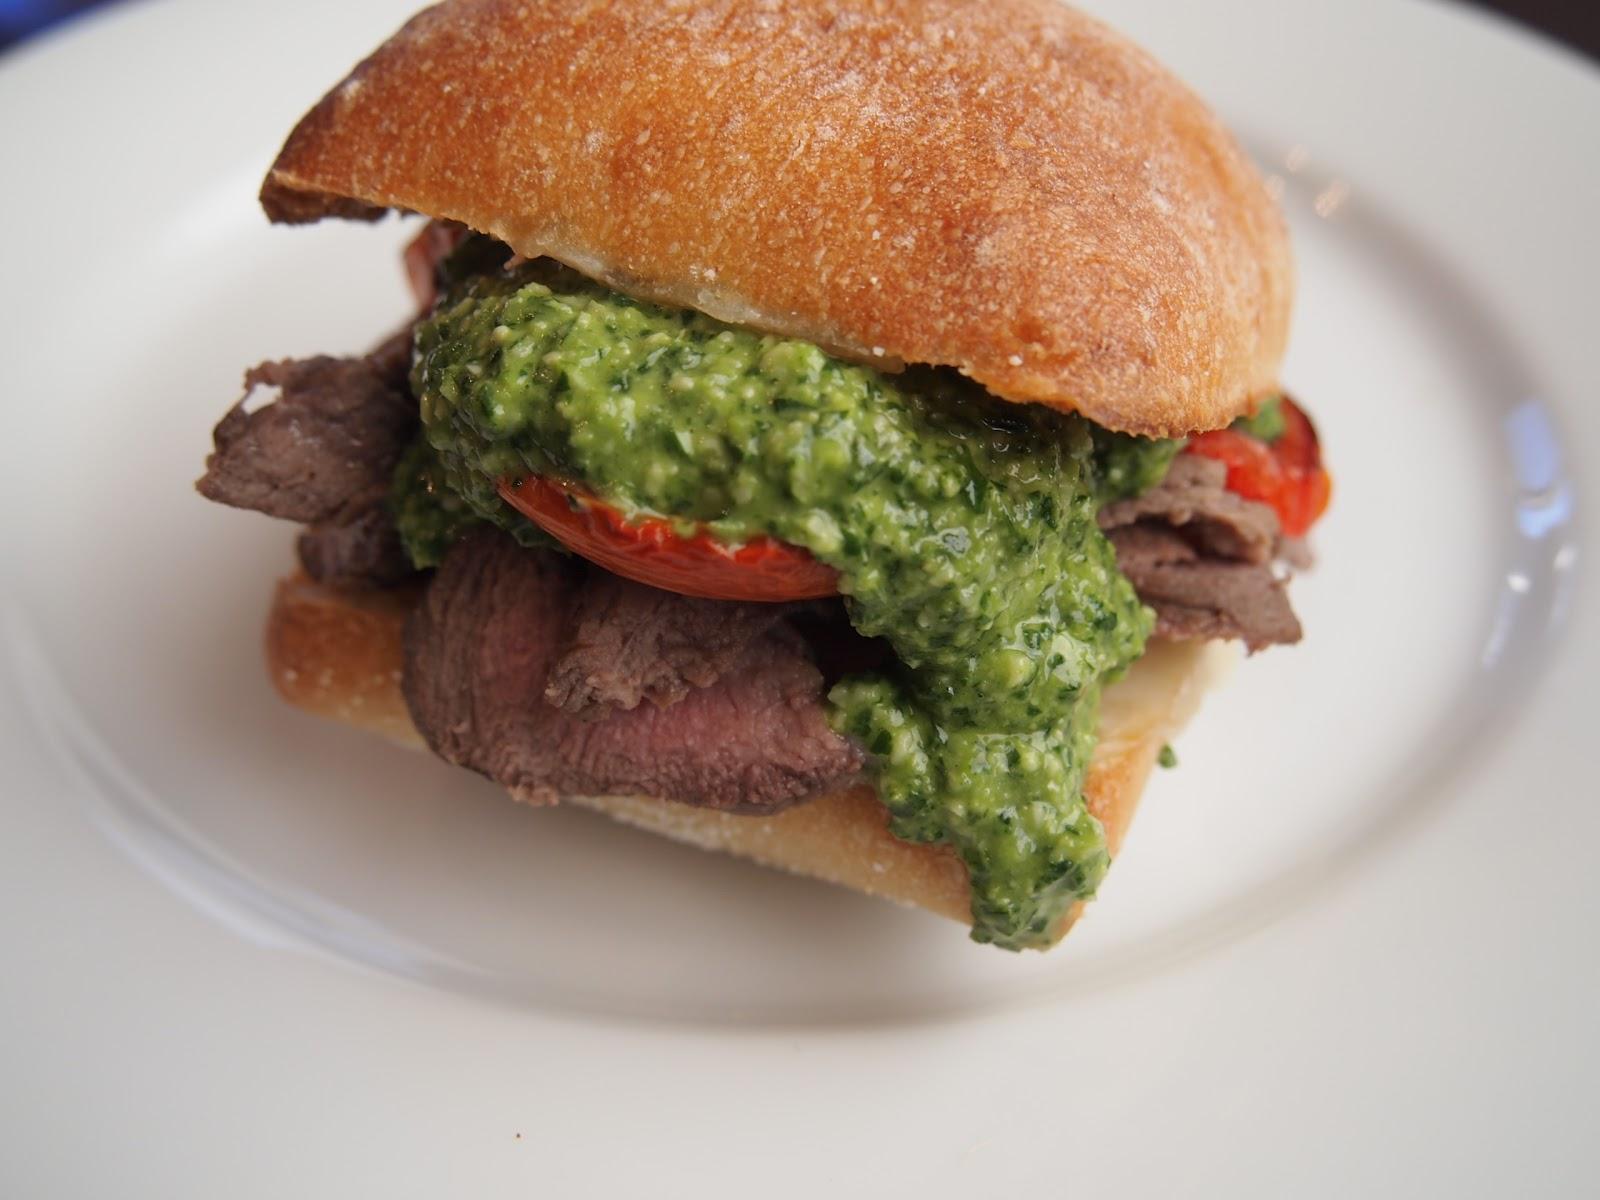 Cracked Up Kitchen: Steak Sandwich with Jalapeno Pesto